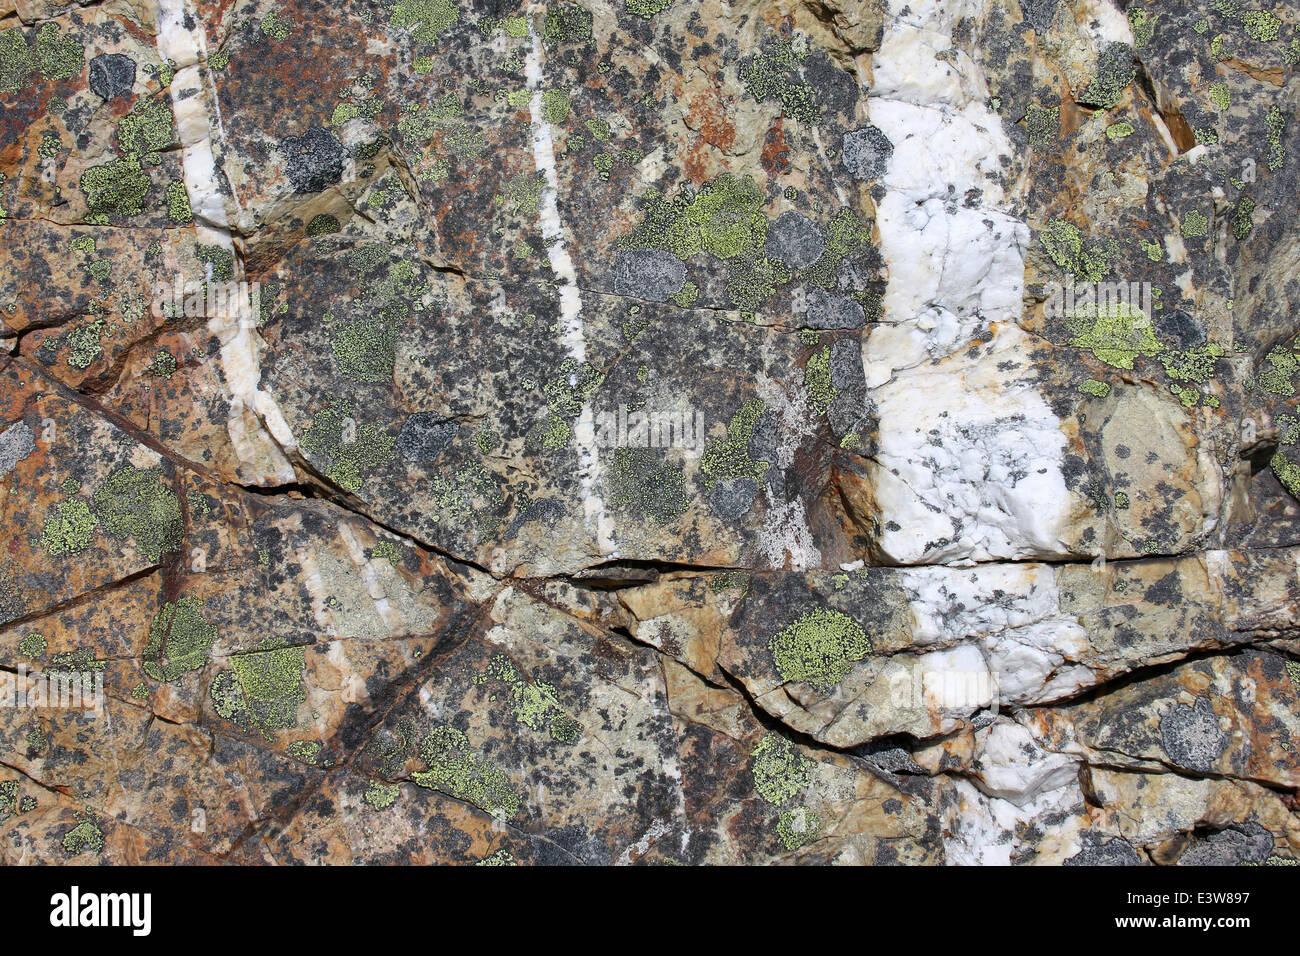 Quartz Veins Running Through Rhyolite - Stock Image